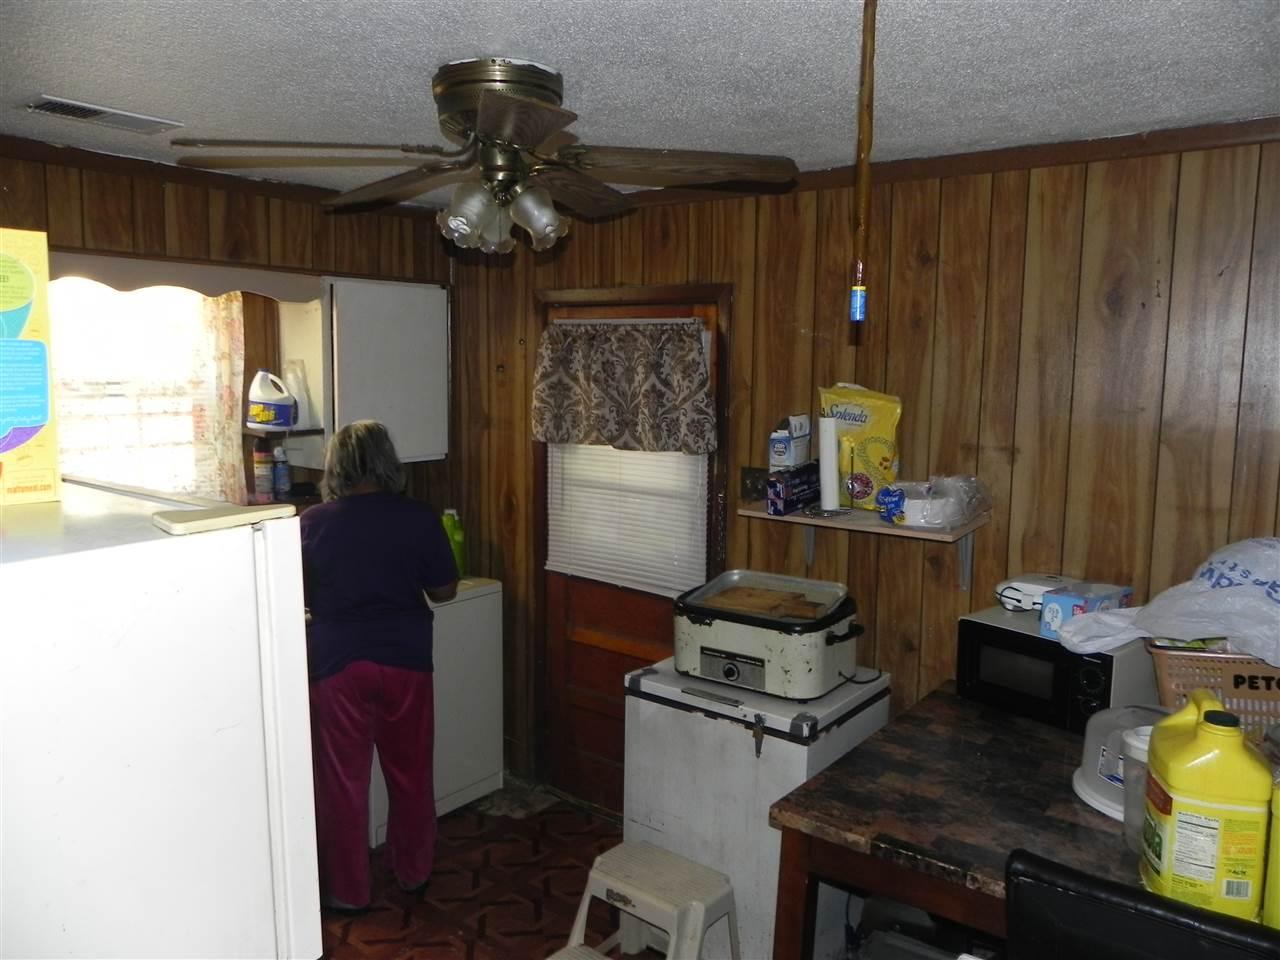 2849 Choctaw Memphis, TN 38114 - MLS #: 10009846